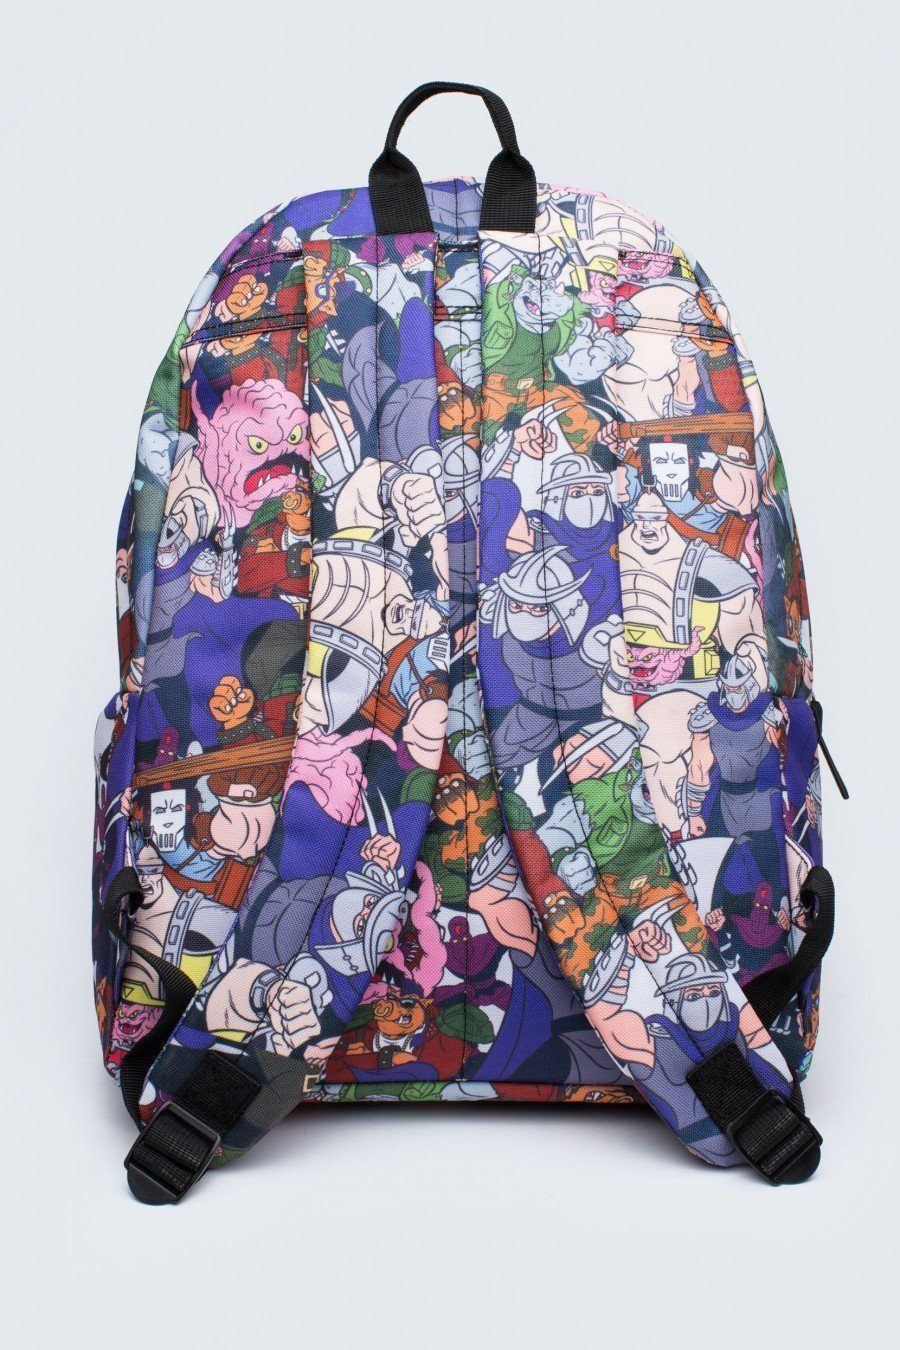 HYPE X Turtles Multi Bad Guys Backpack